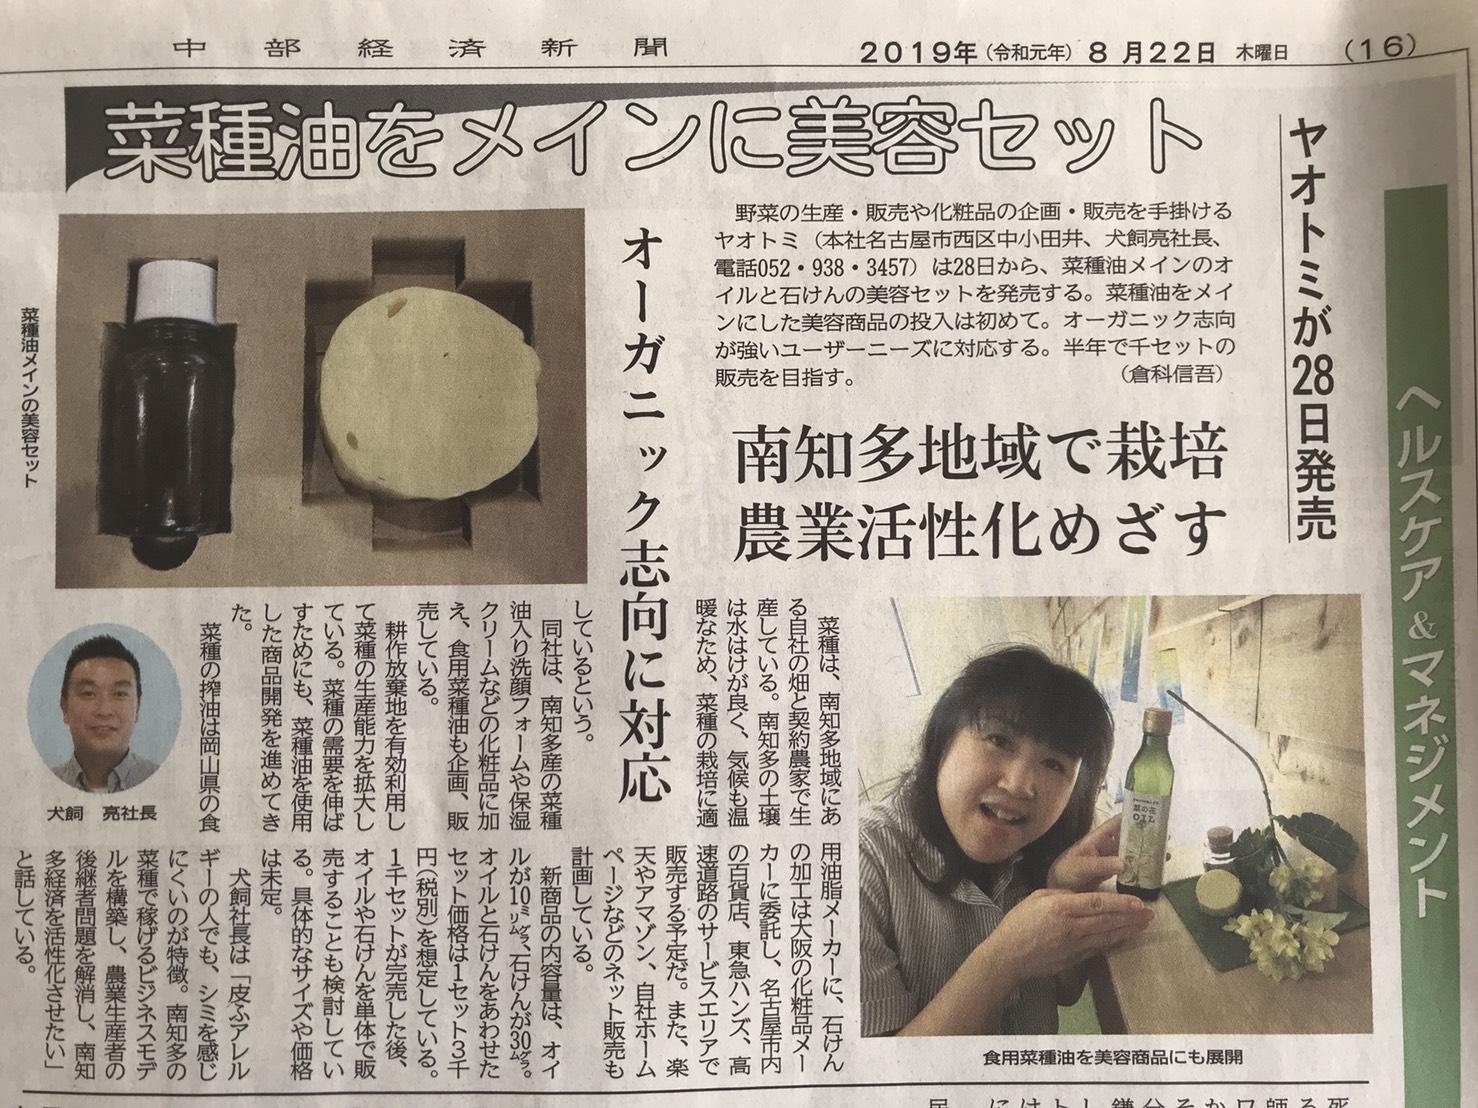 yaotomi 中部経済新聞記事